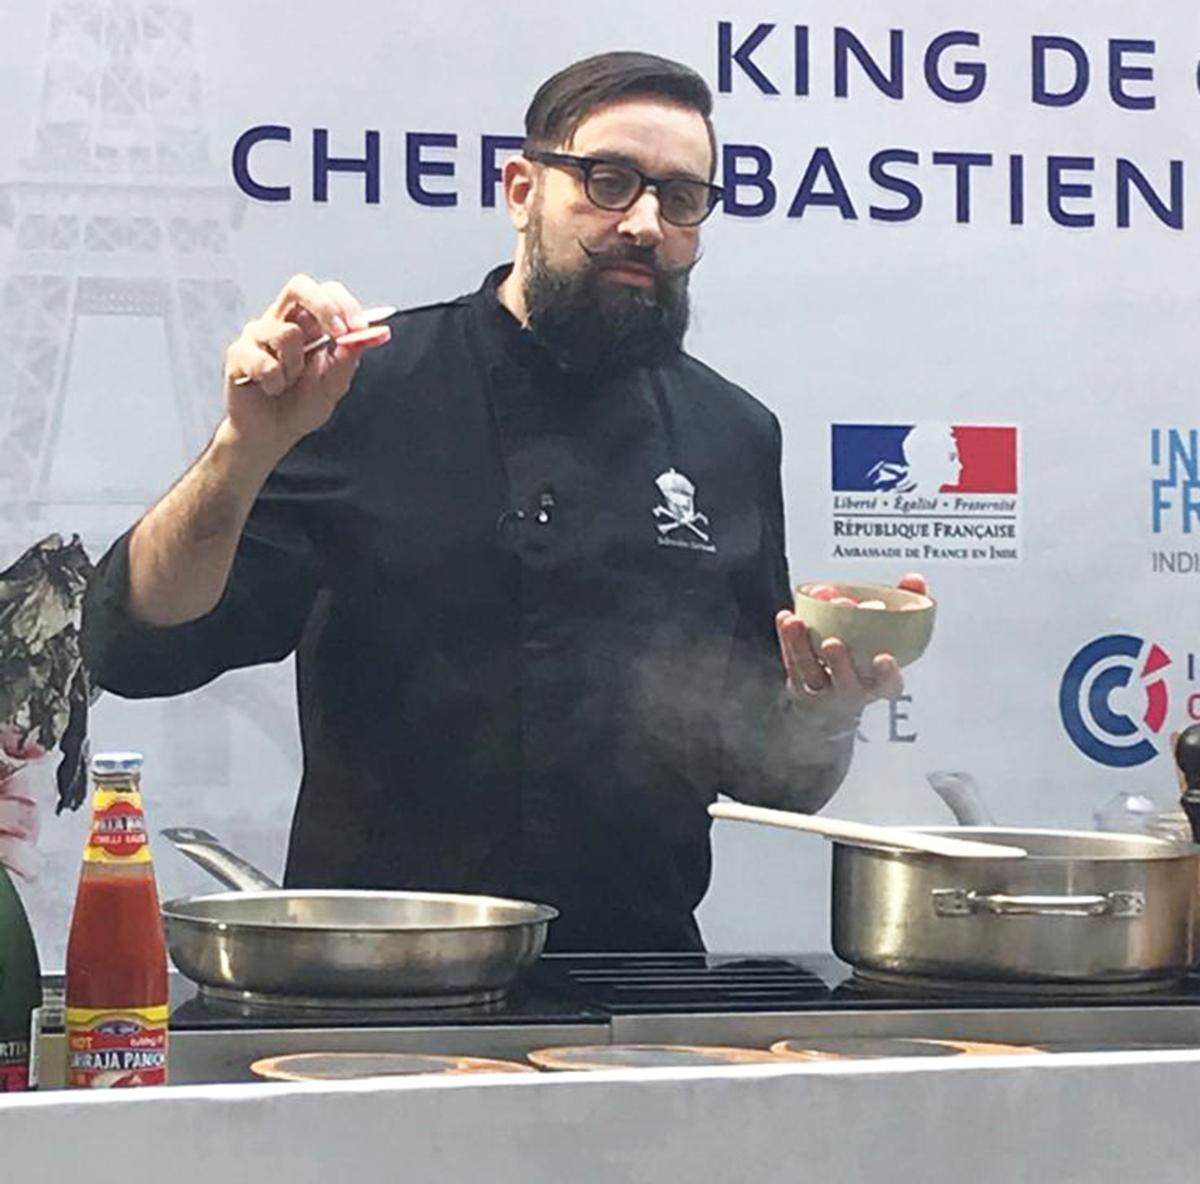 Chef Sébastien Kardinal: A Vegetarian Hedonist